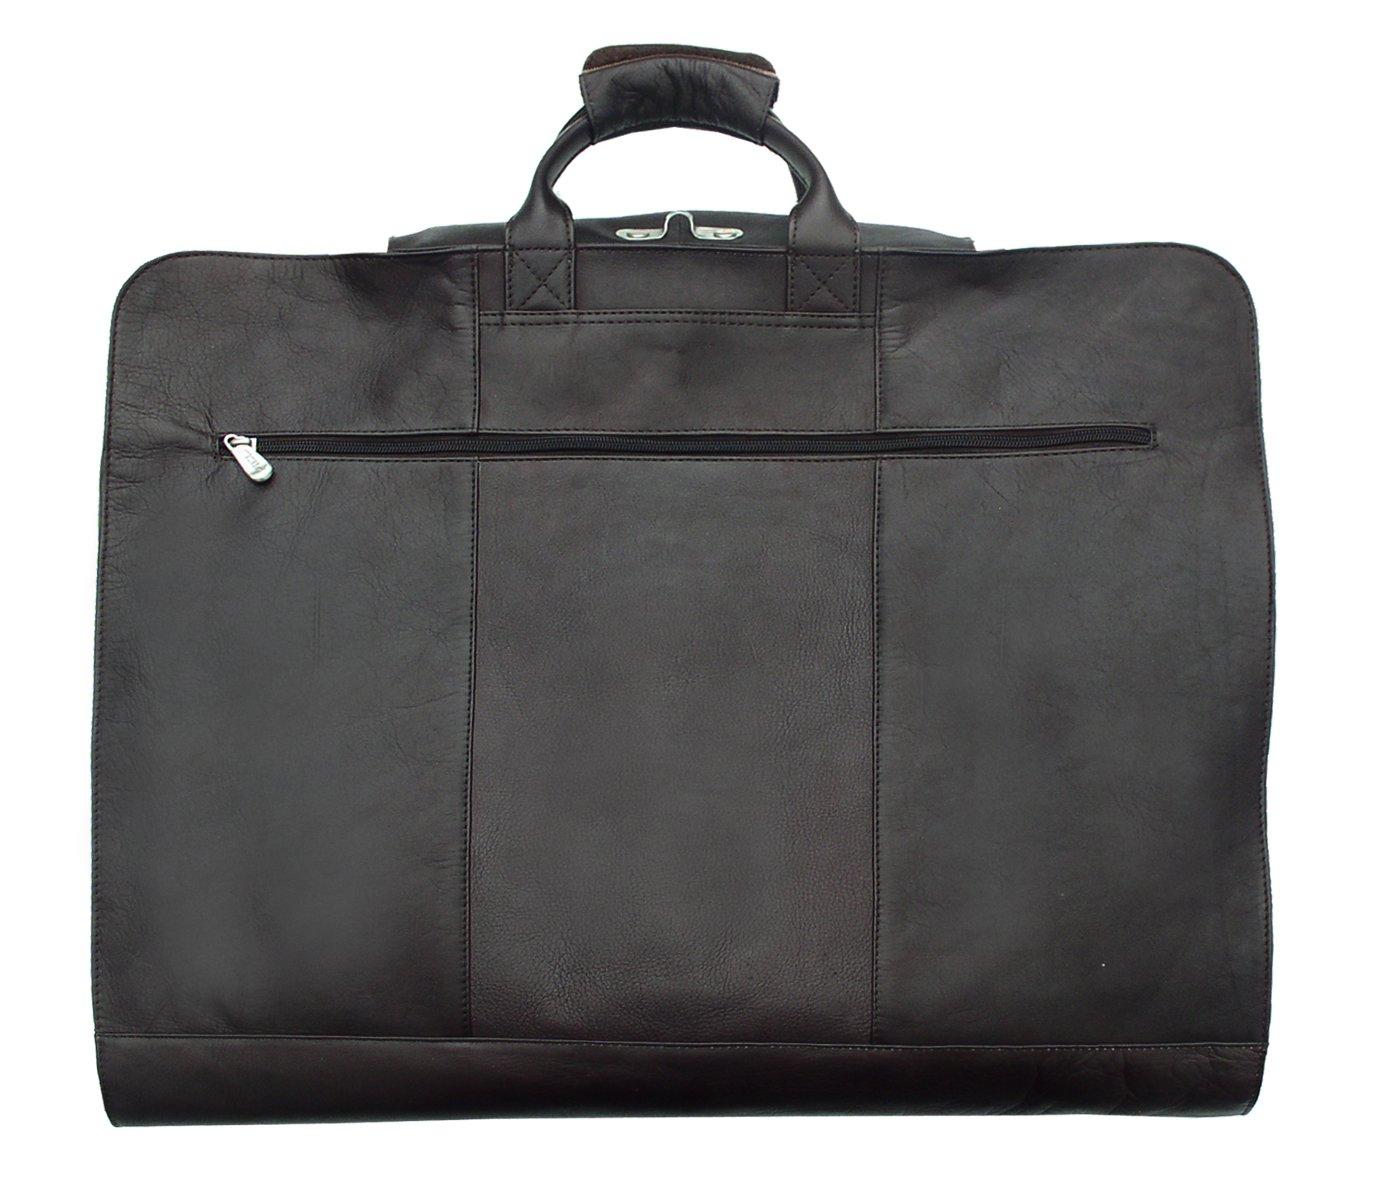 Piel Leather Traveler Garment Cover in Black